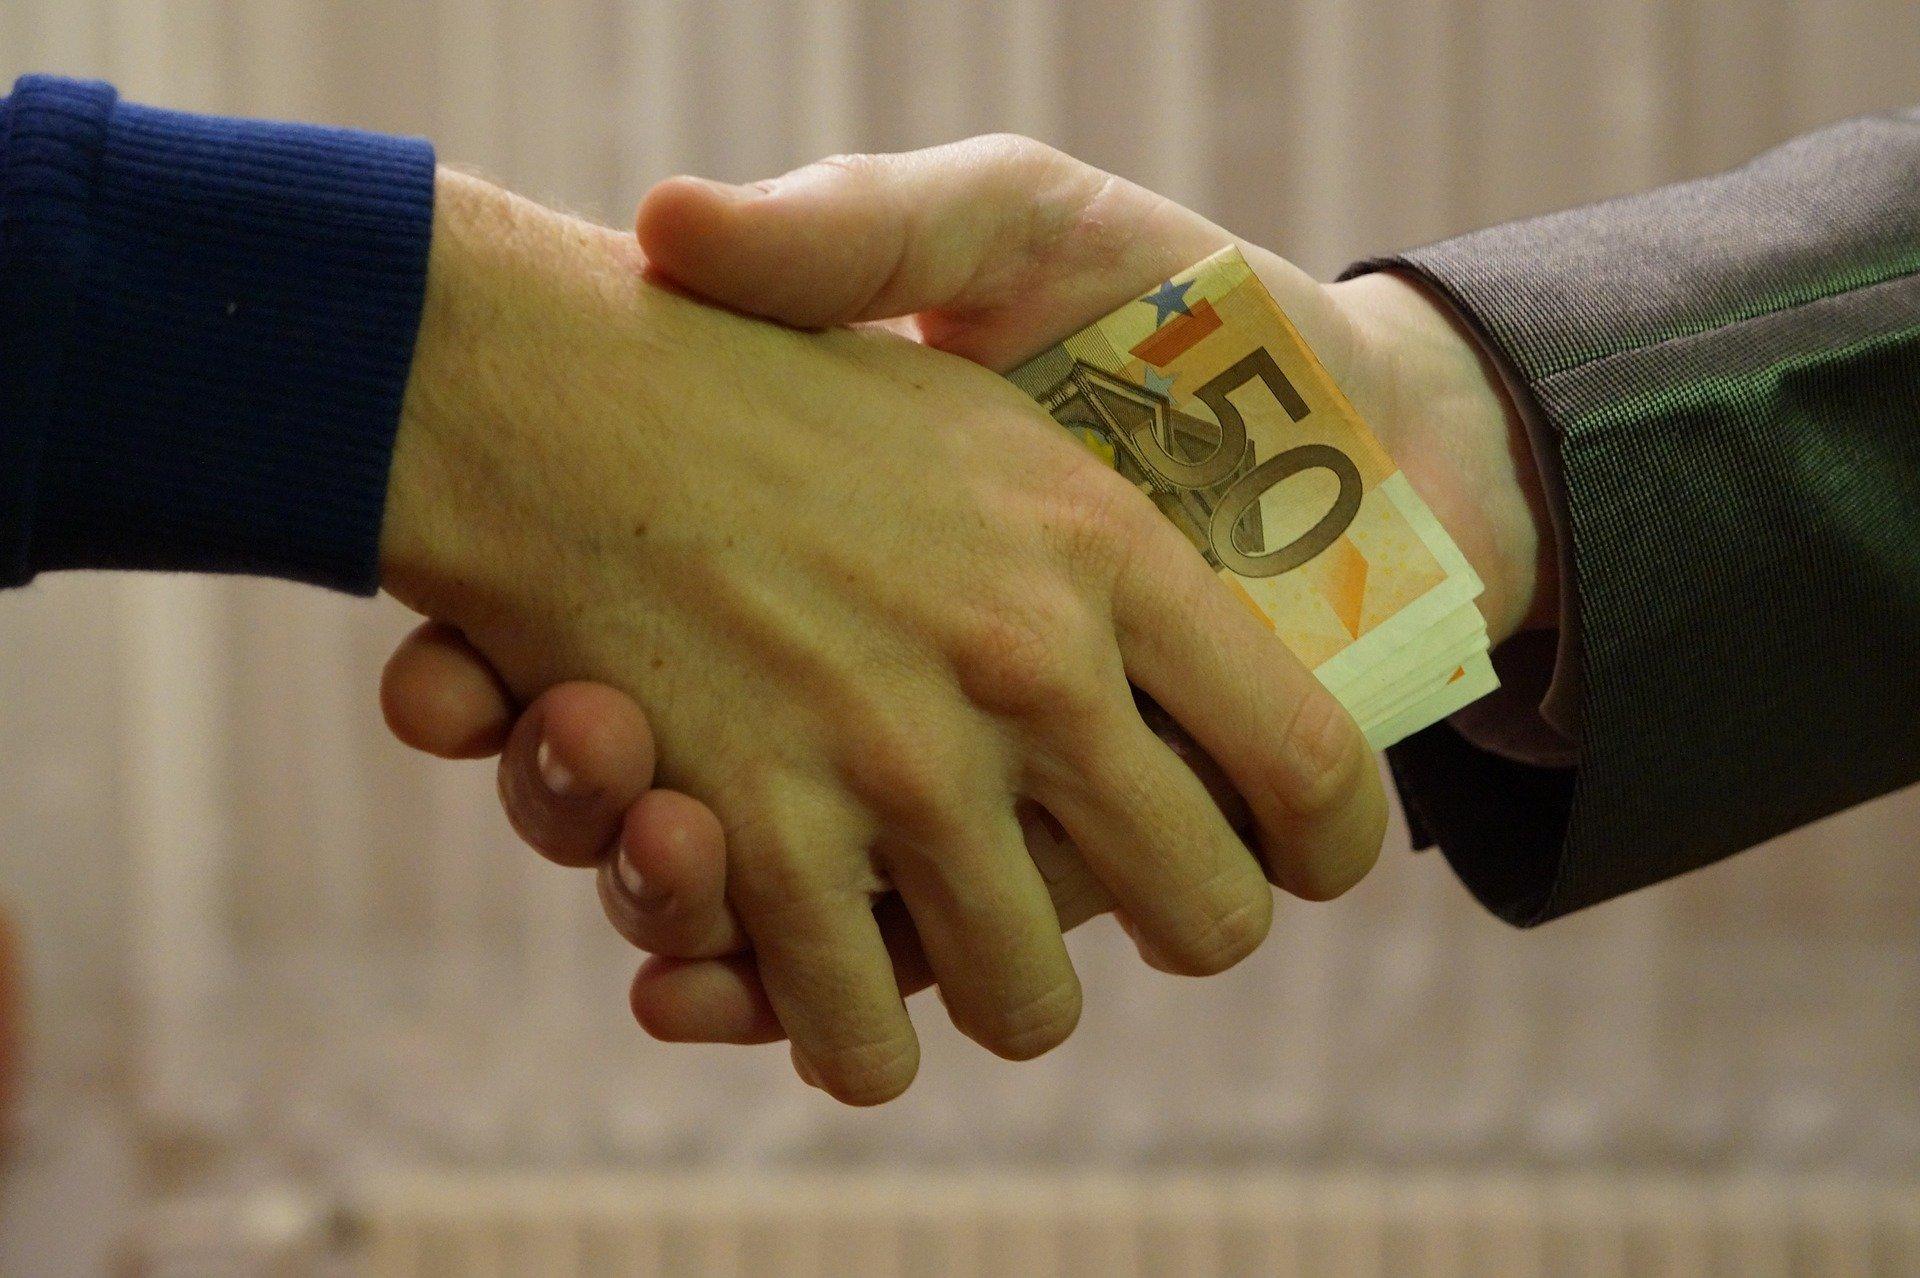 Bilan emprunt bancaire d'avril 2020